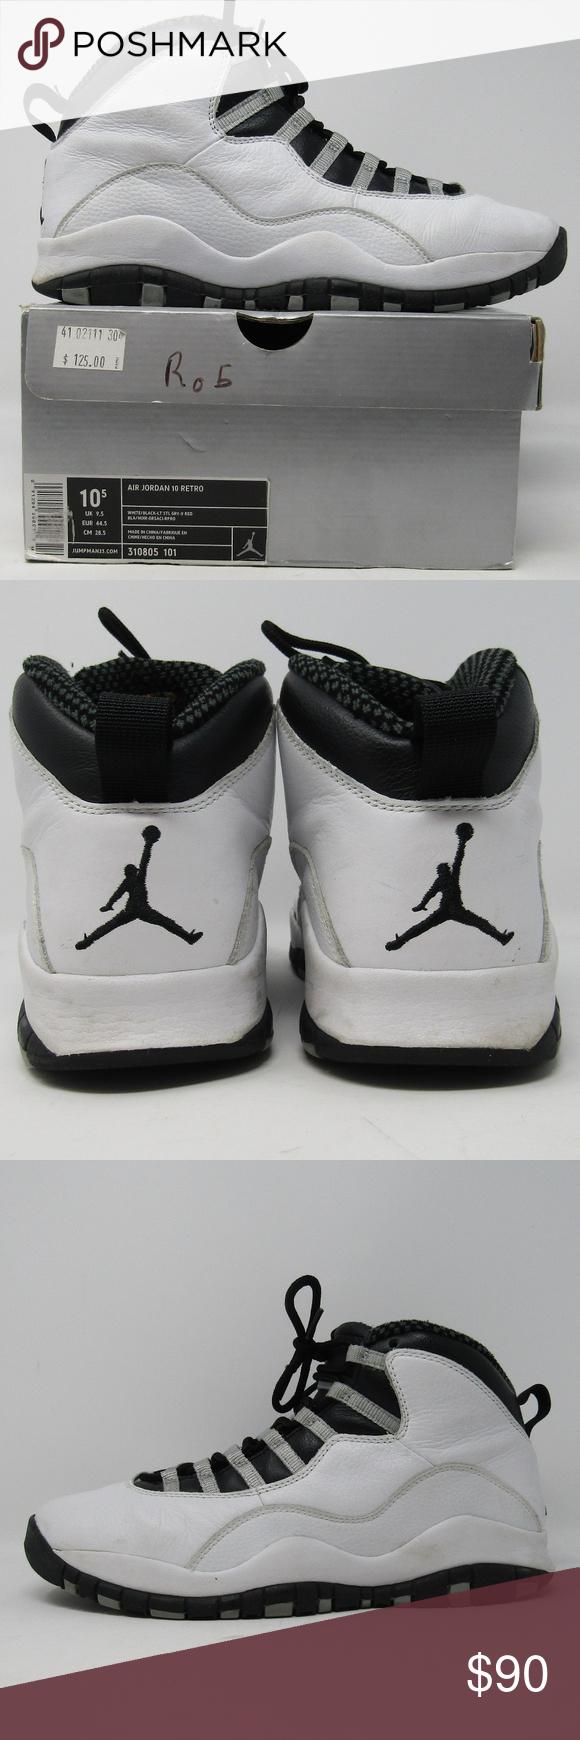 Air Jordan 10 Sz 10.5 White Black